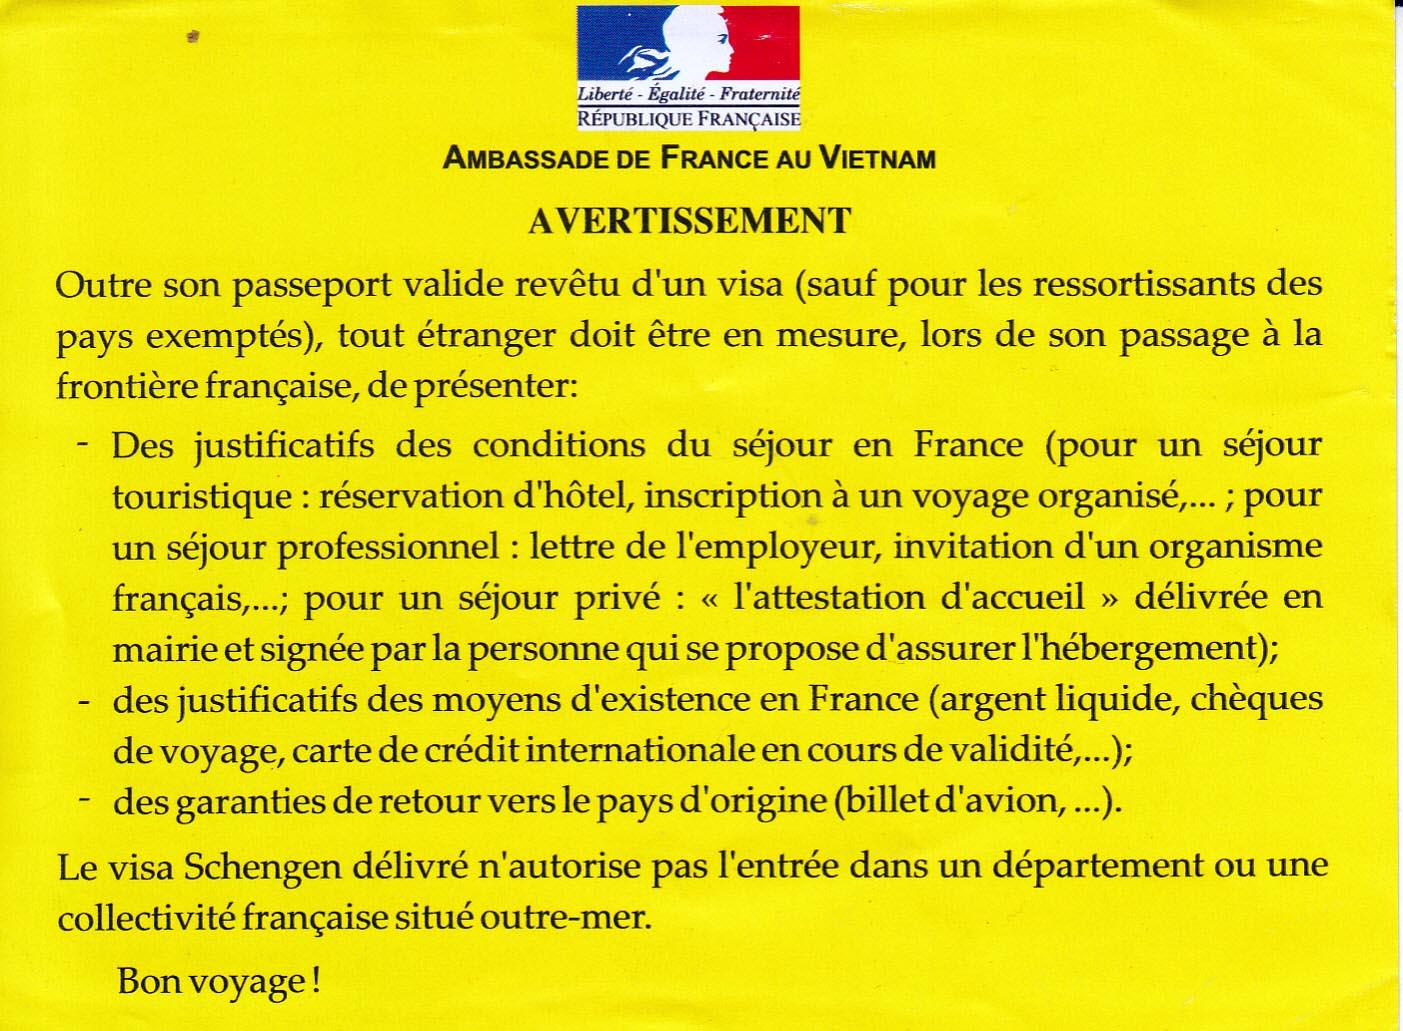 http://dongoc.free.fr/dongoc/img/avertissement.jpg